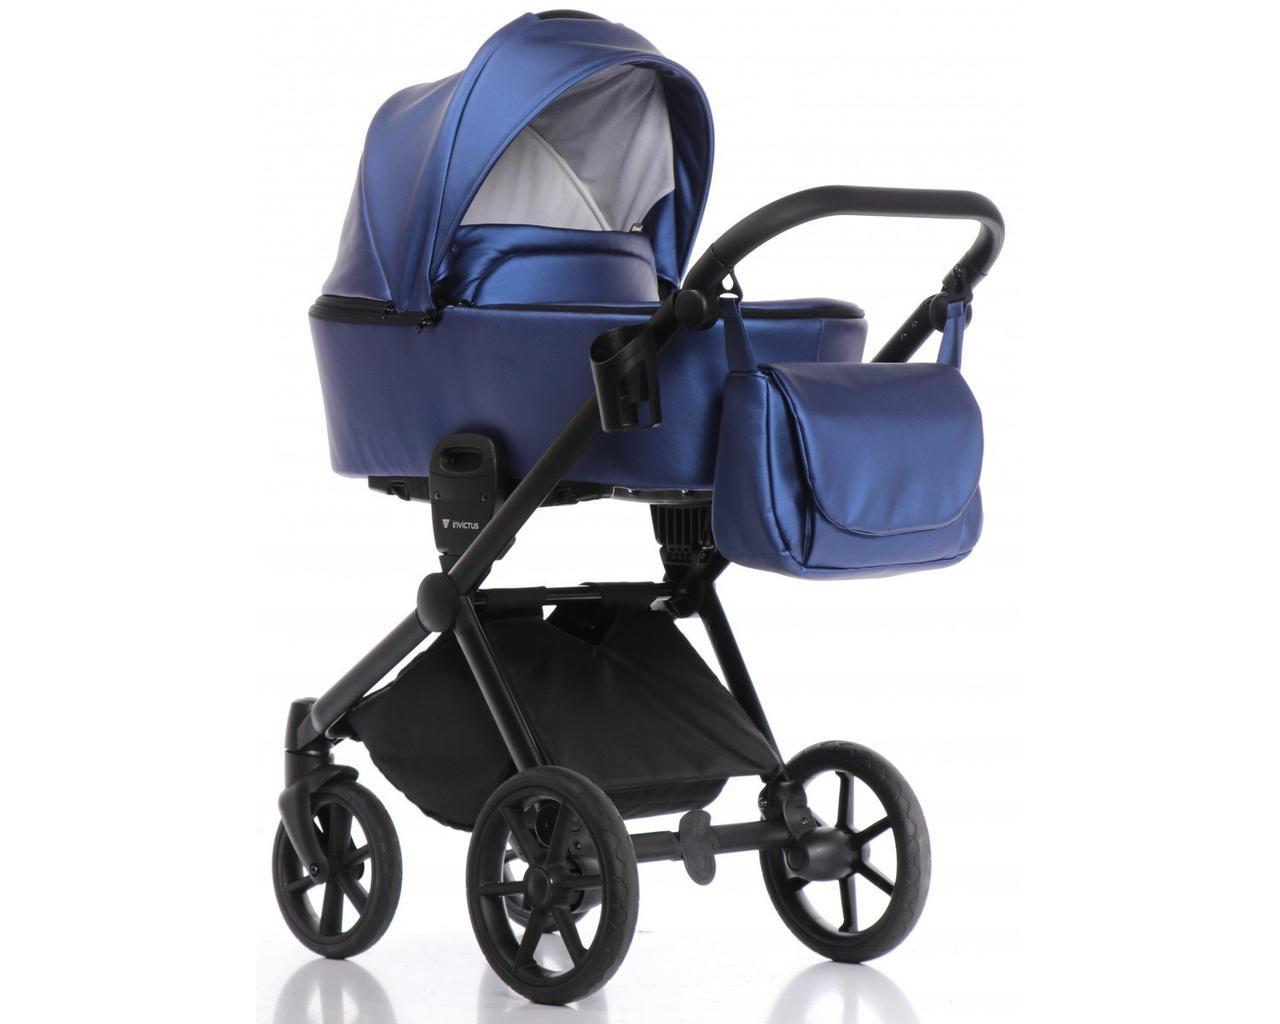 Дитяча коляска 2 в 1 Invictus V-Dream Lux Blue With Black